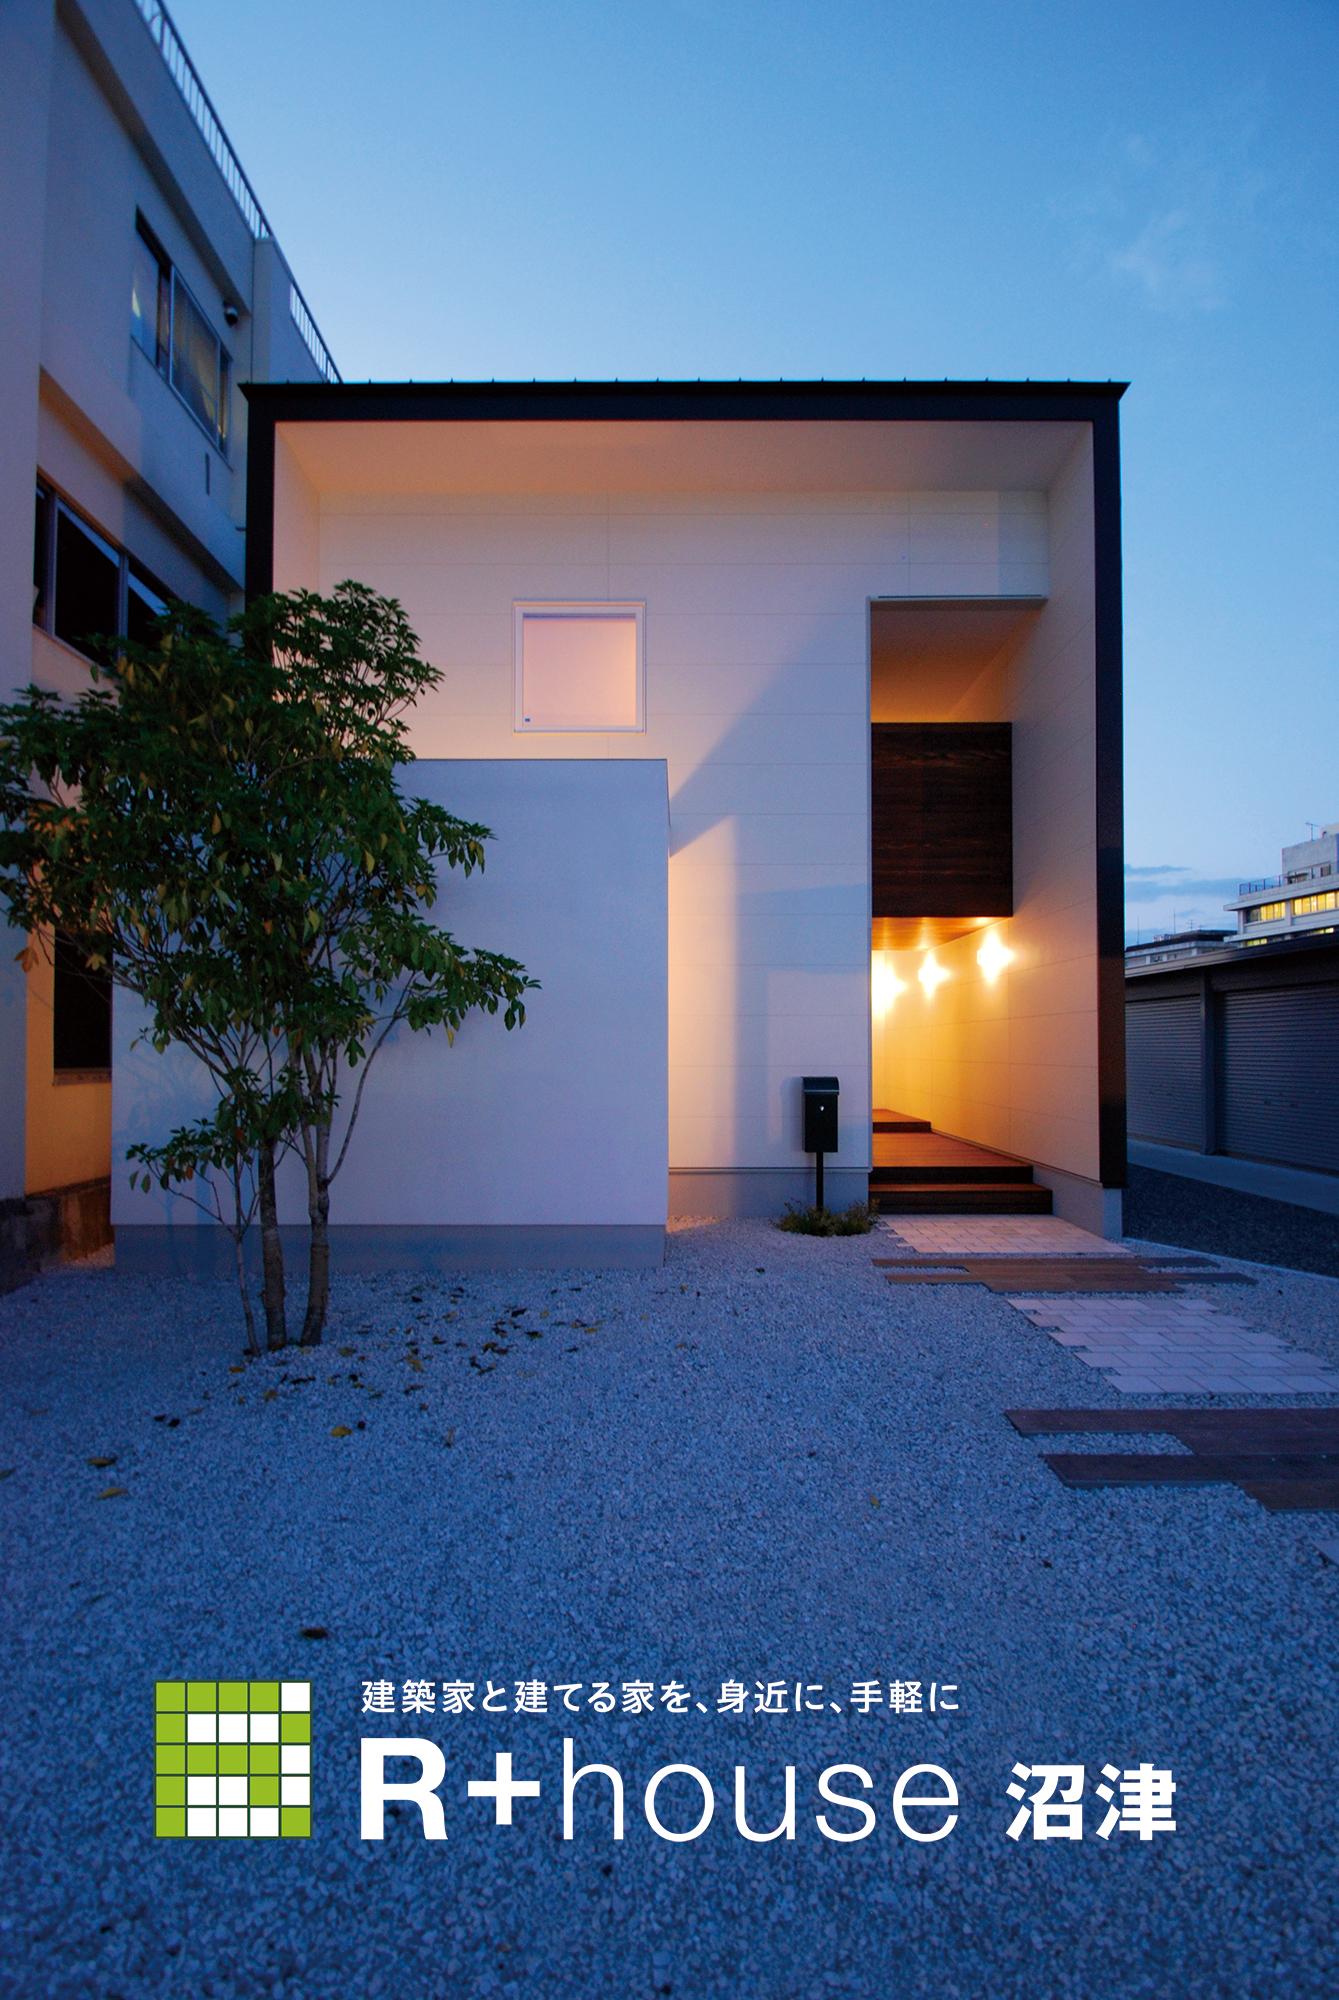 R+house沼津(HOUSE PLAN)のイメージ